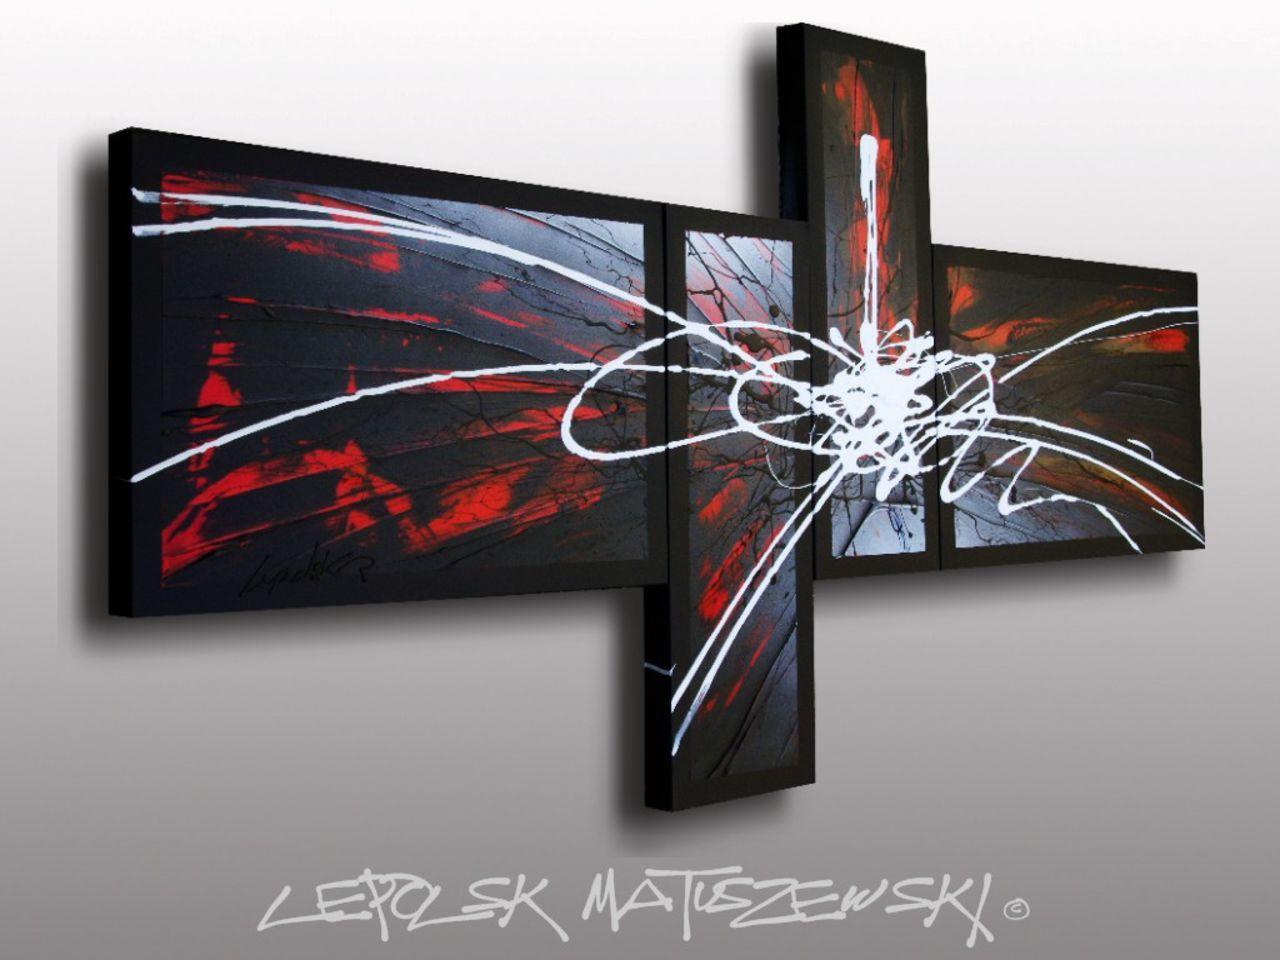 MISTER K  (Lepolsk Matuszewski) BLACK HAZE